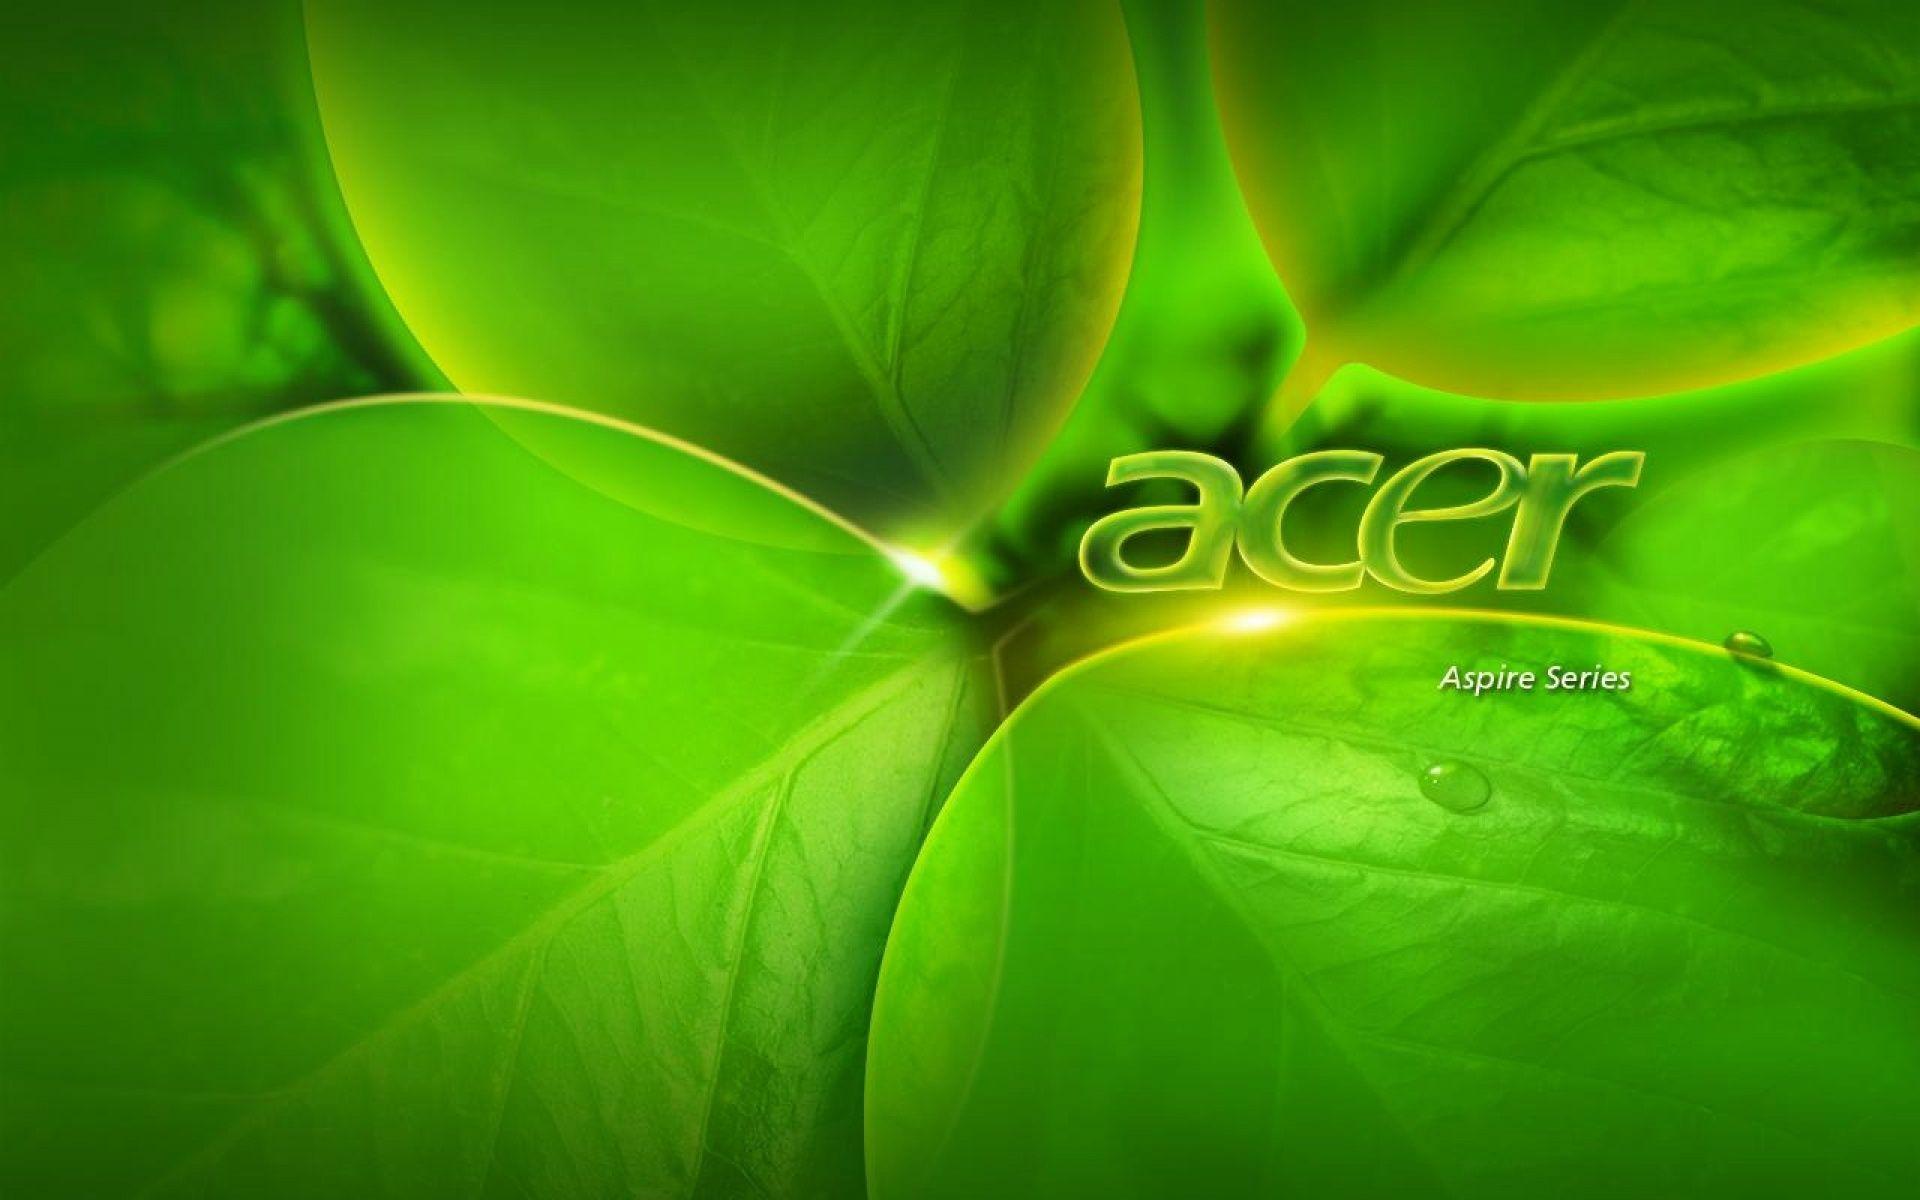 Acer wallpapers Acer wallpapers Wallpapers For